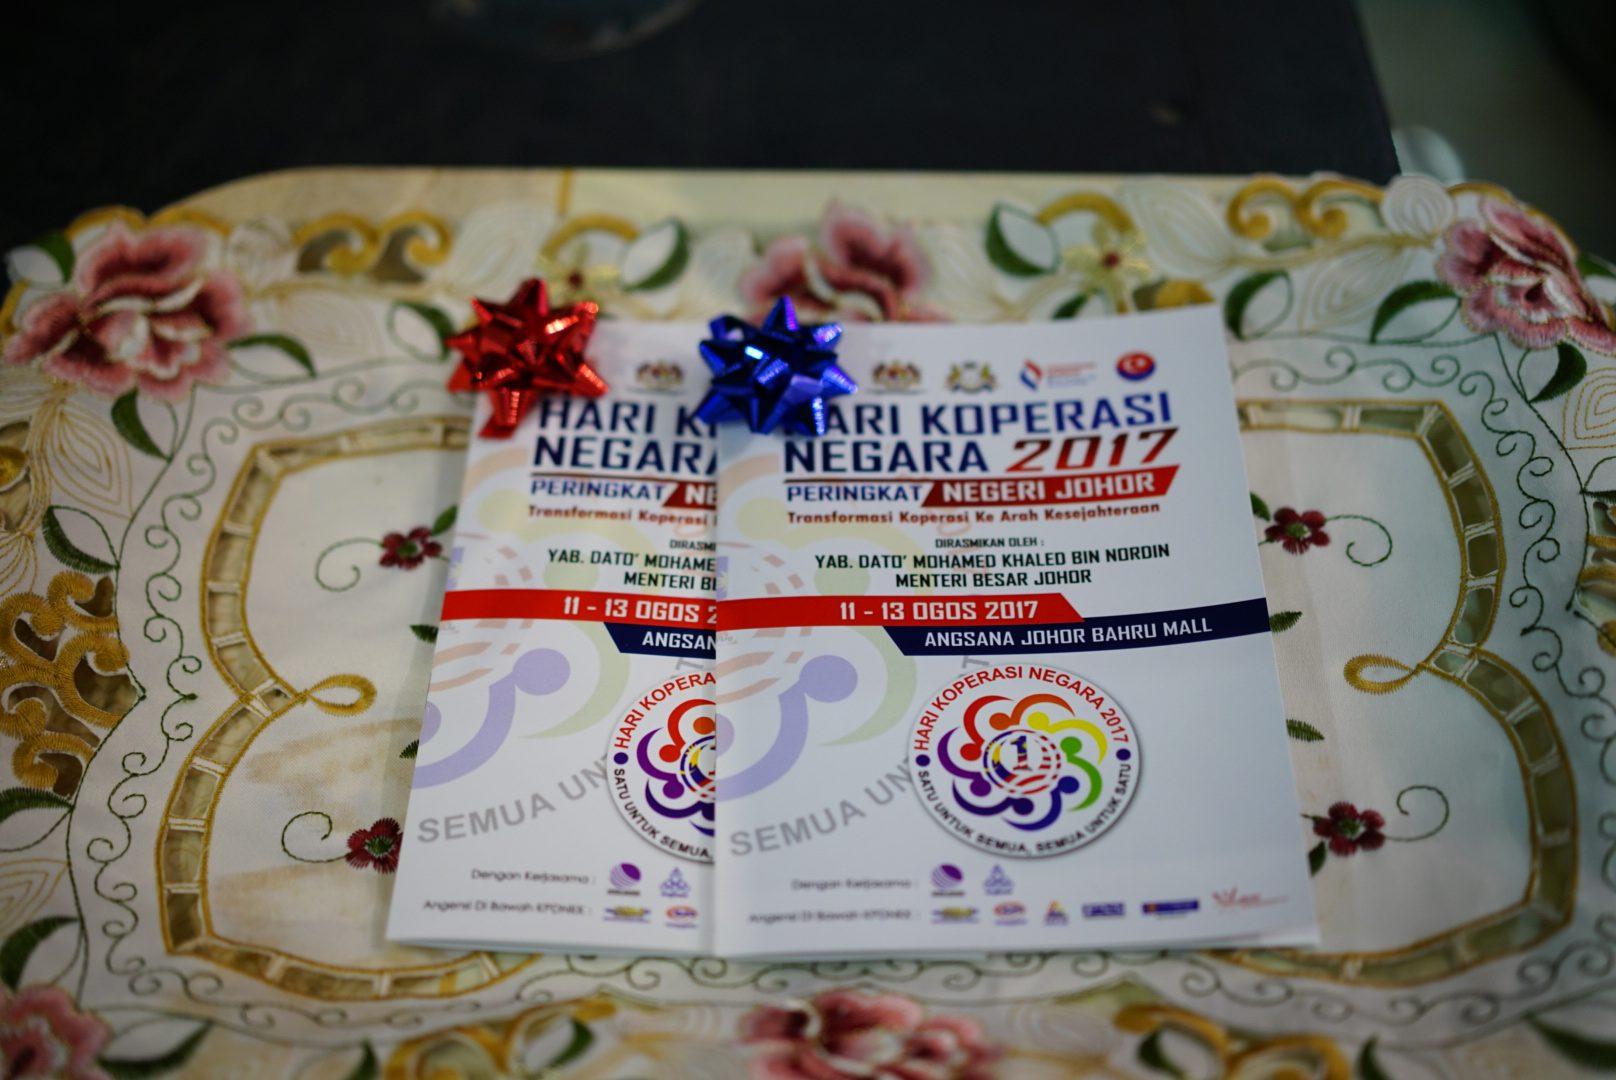 Hari Koperasi Negara Peringkat Negeri Johor